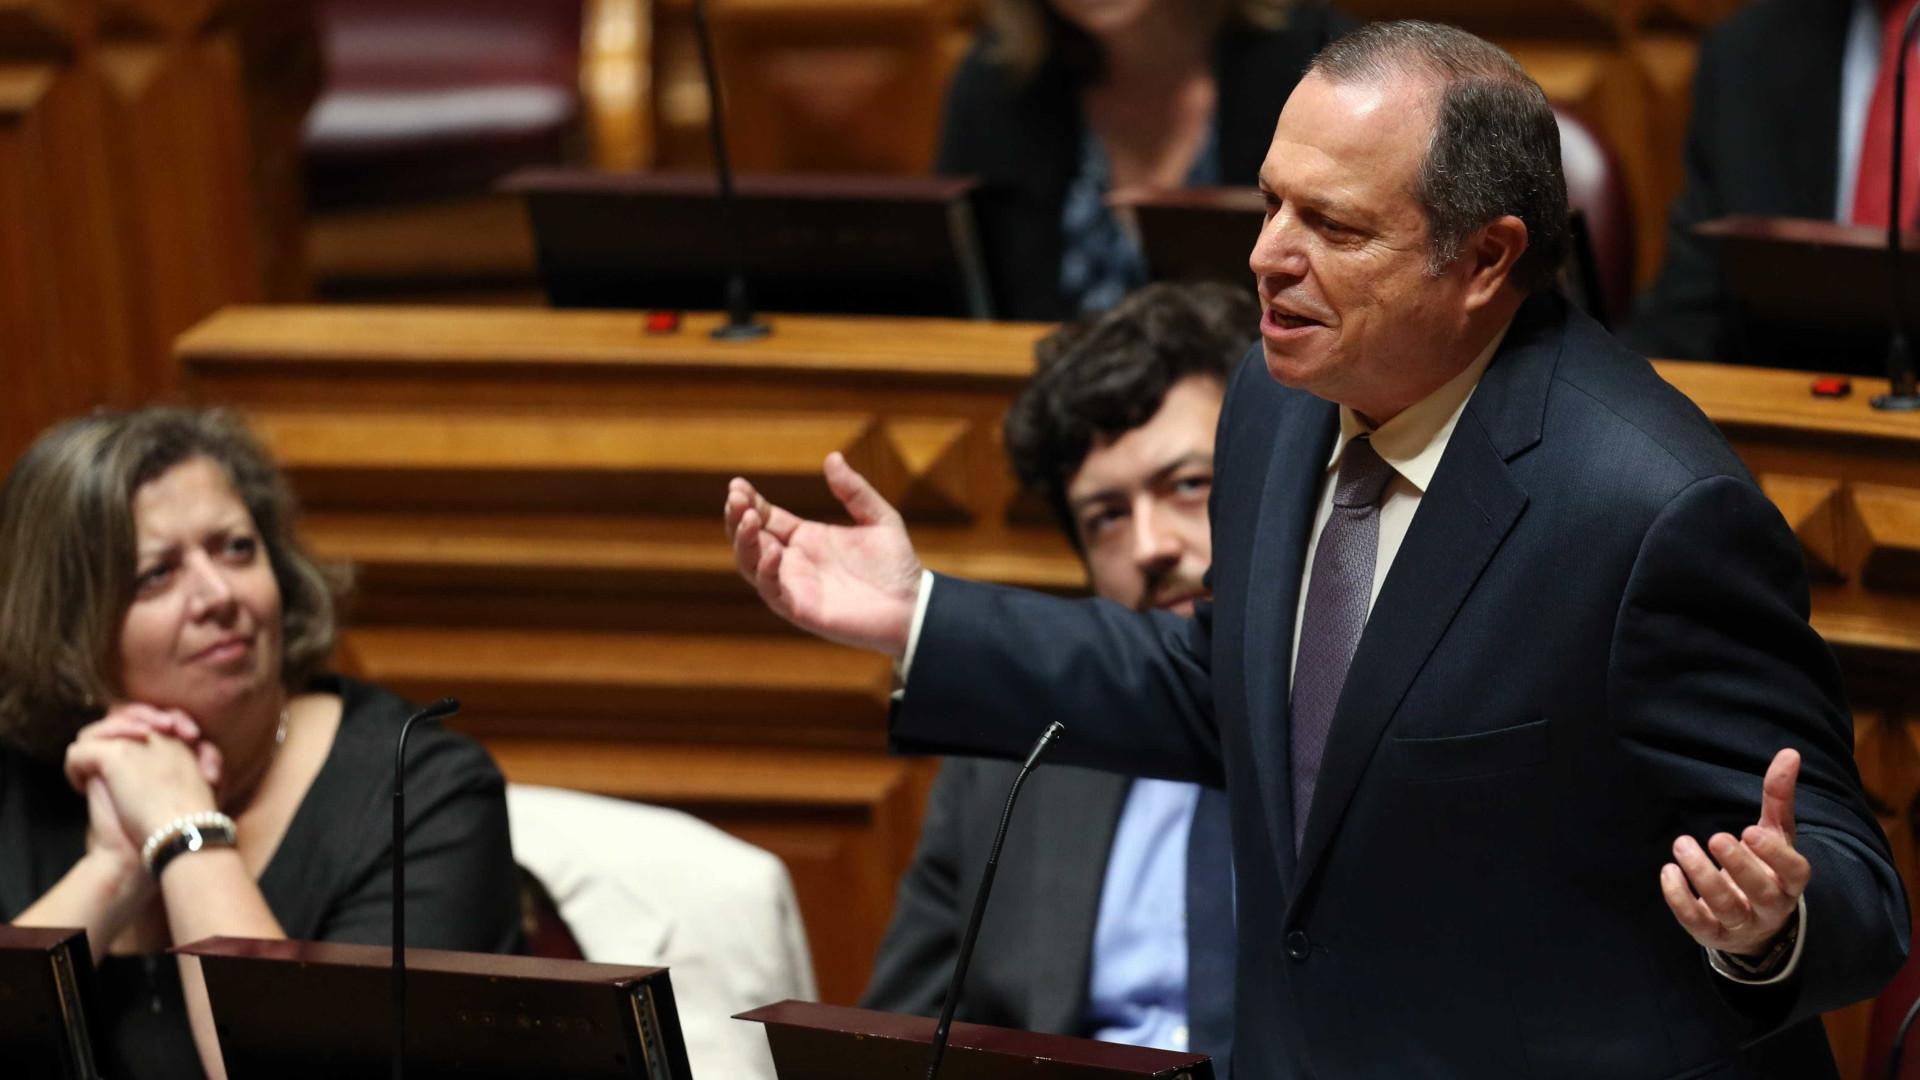 "PS desconhece ""naturalmente"" sentido de voto do Bloco, PCP e Verdes"